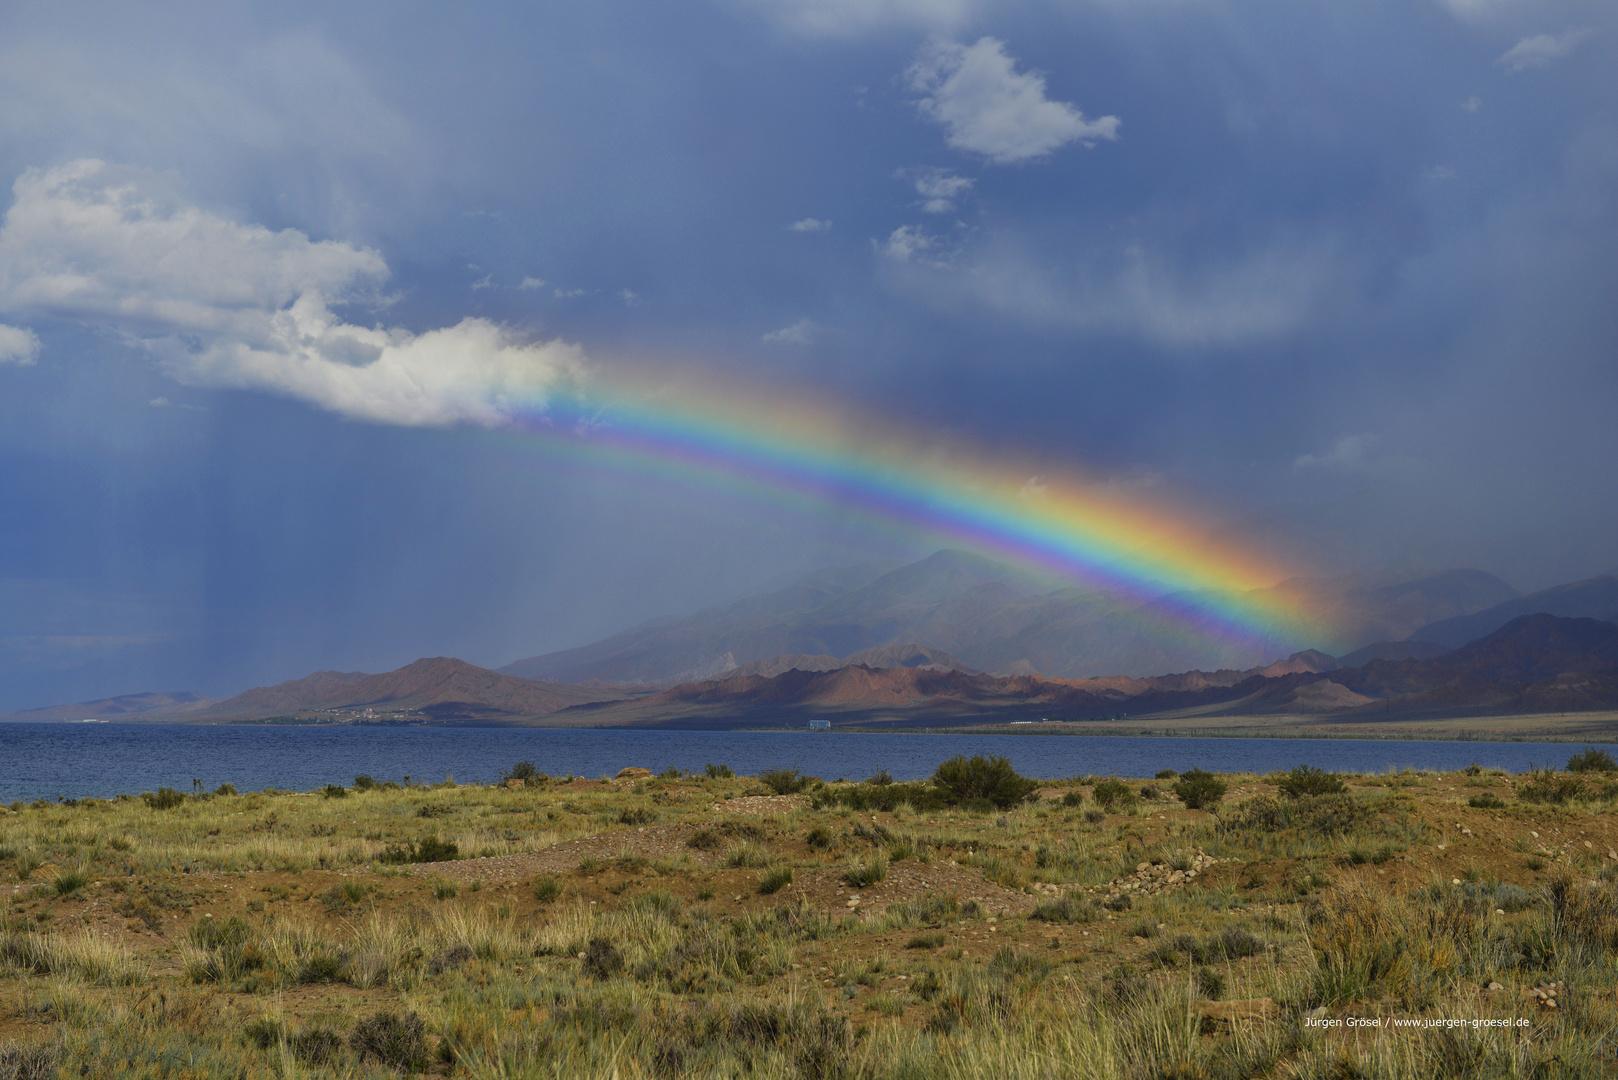 Ein Regenbogen über dem Issyk-Kul-See in Kirgisistan 2015